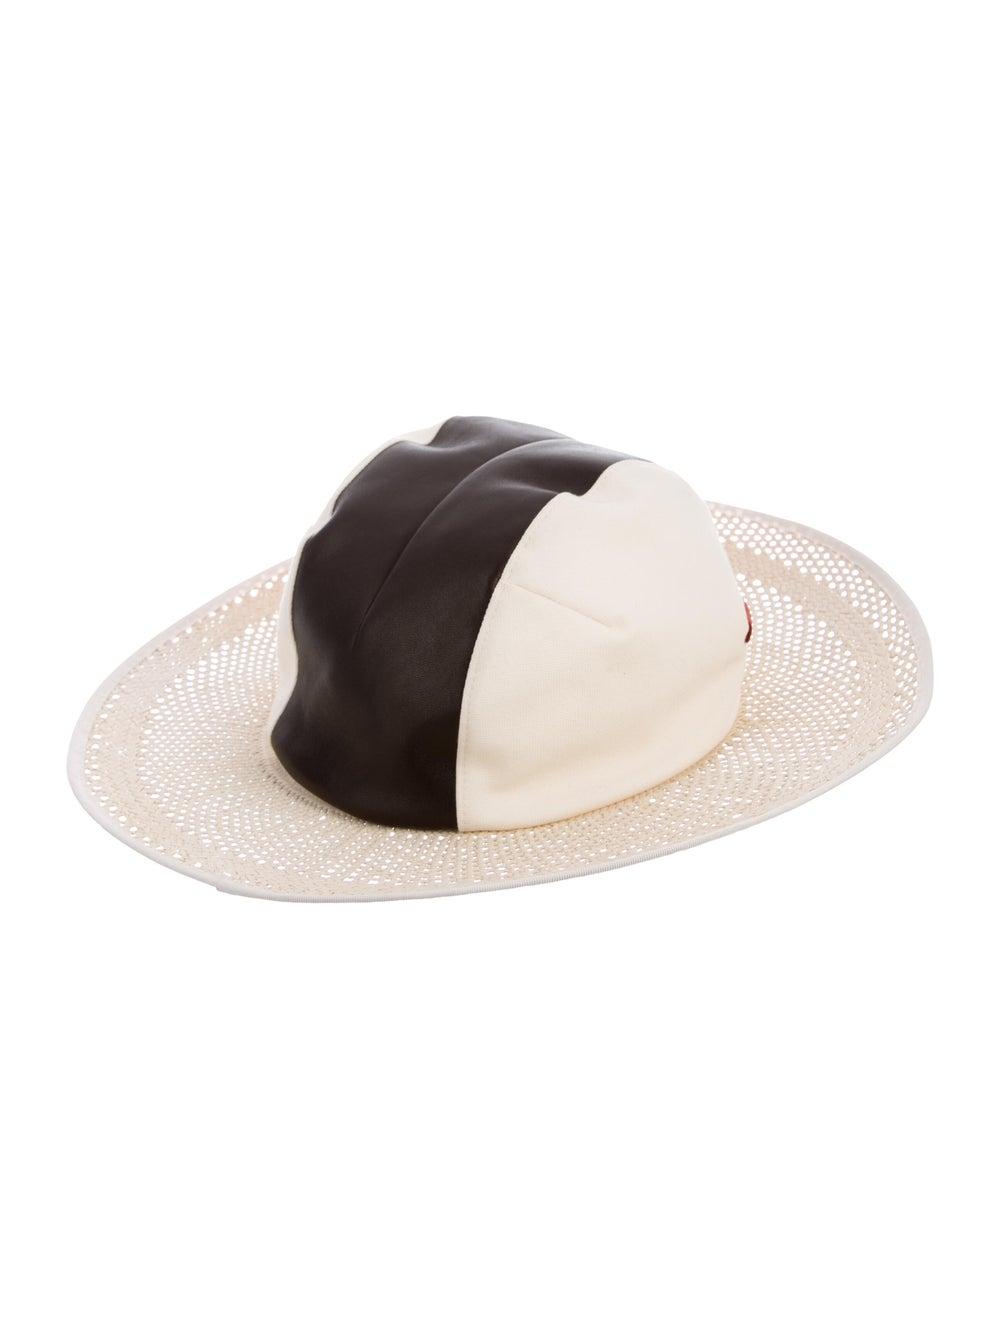 Noel Stewart Straw Wide-Brim Hat multicolor - image 2